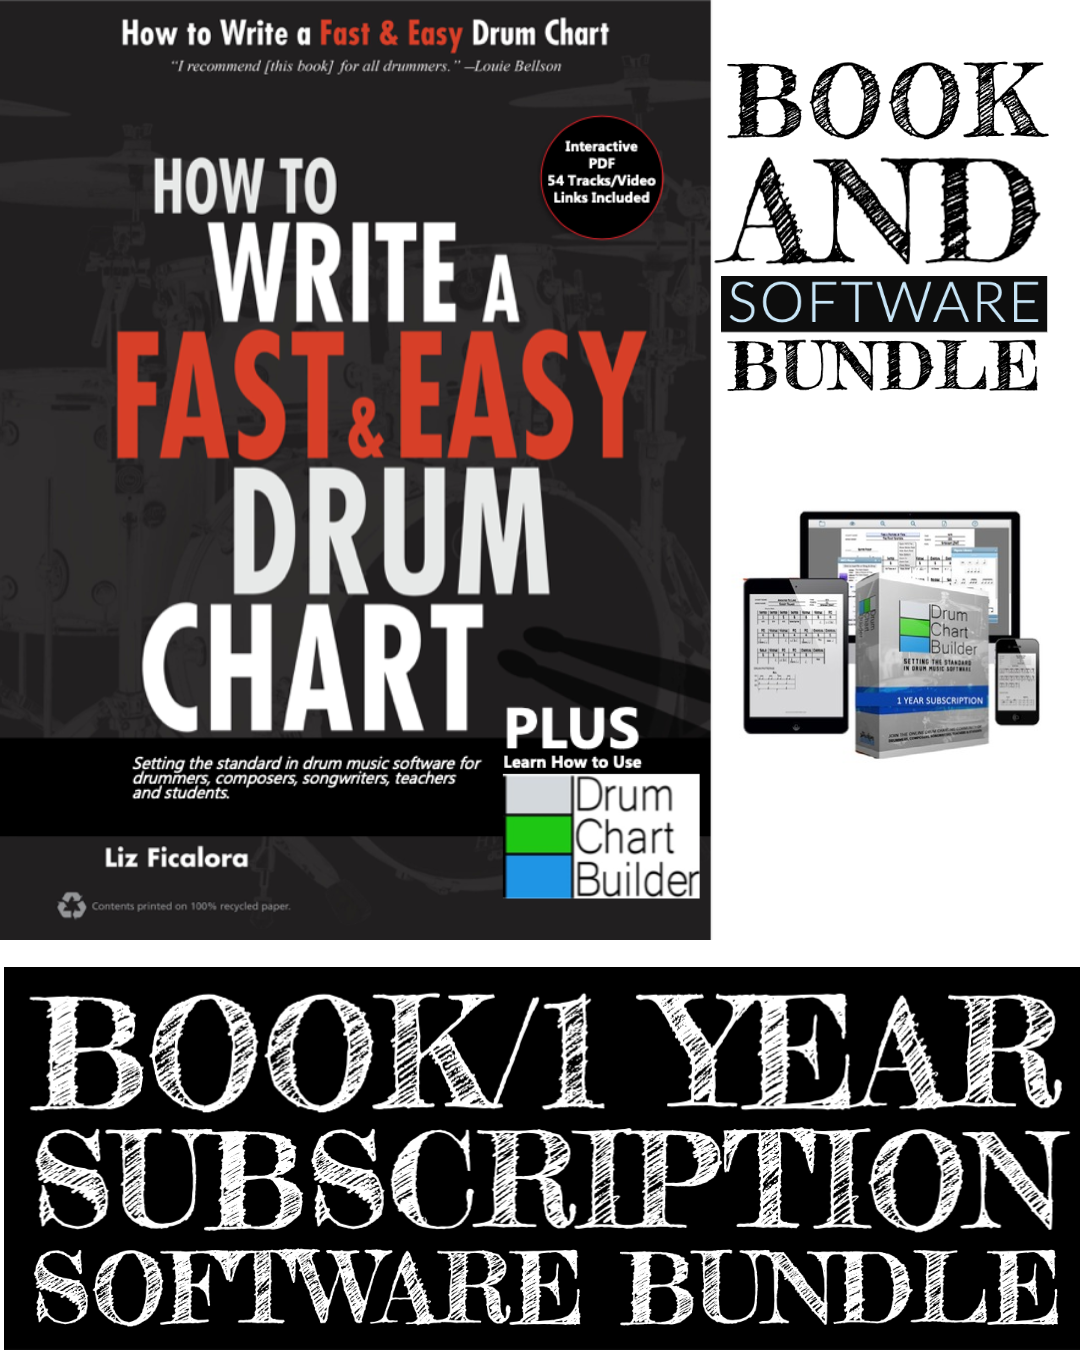 book an software bundle no price bigger